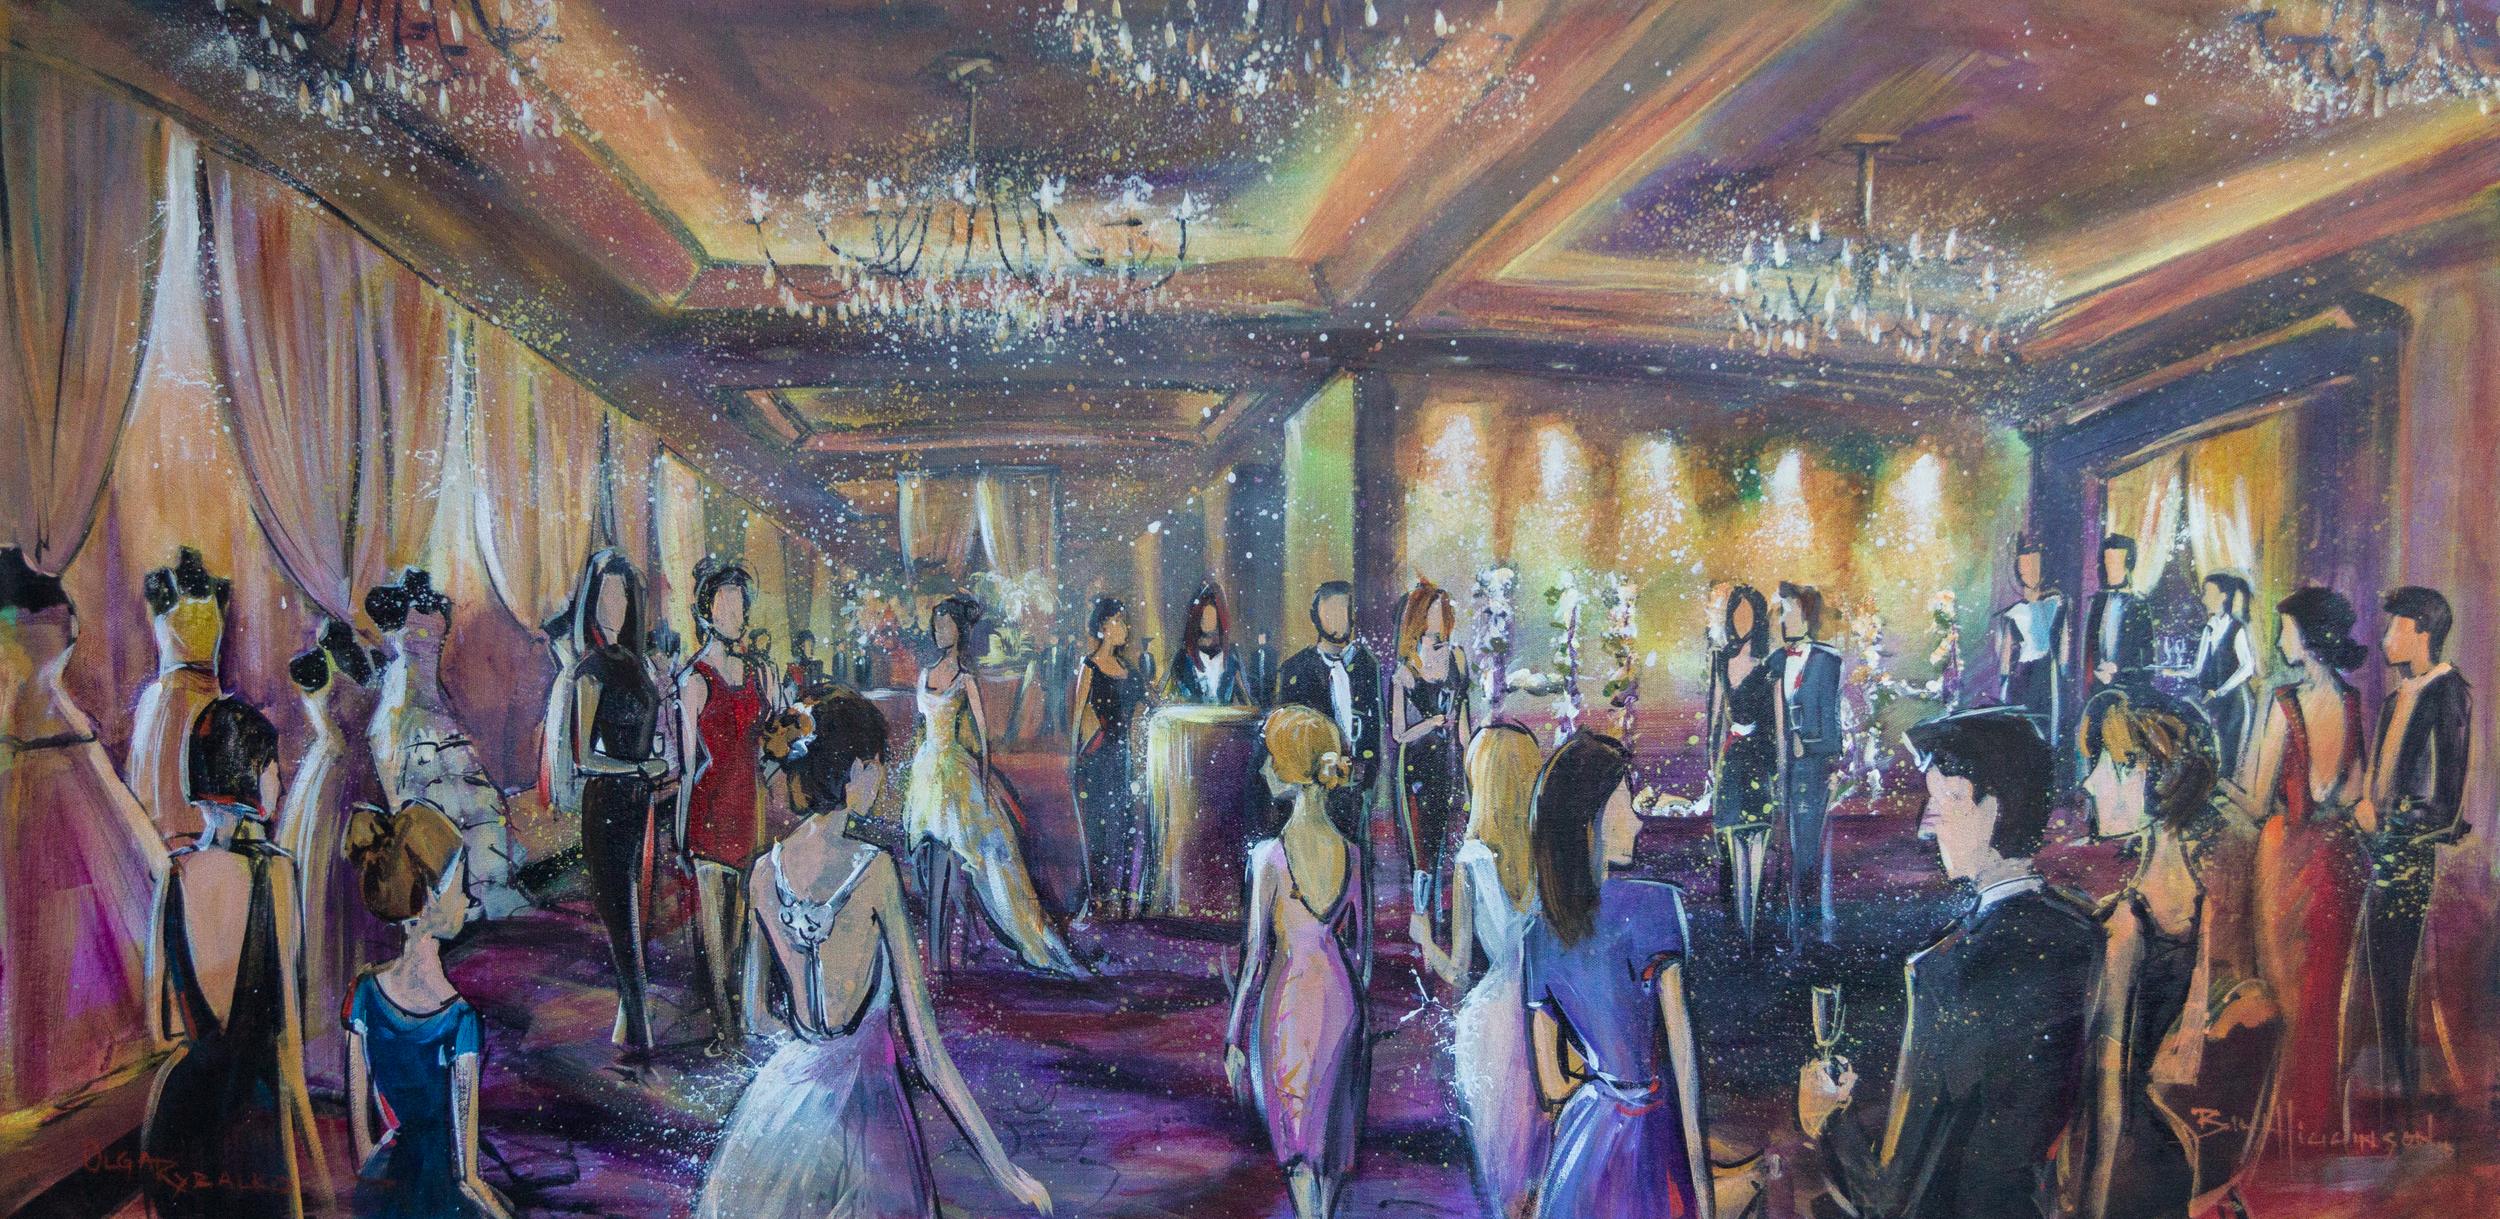 impressions_live_art_wedding_painting_hush_wedding_show_terminal_city_club